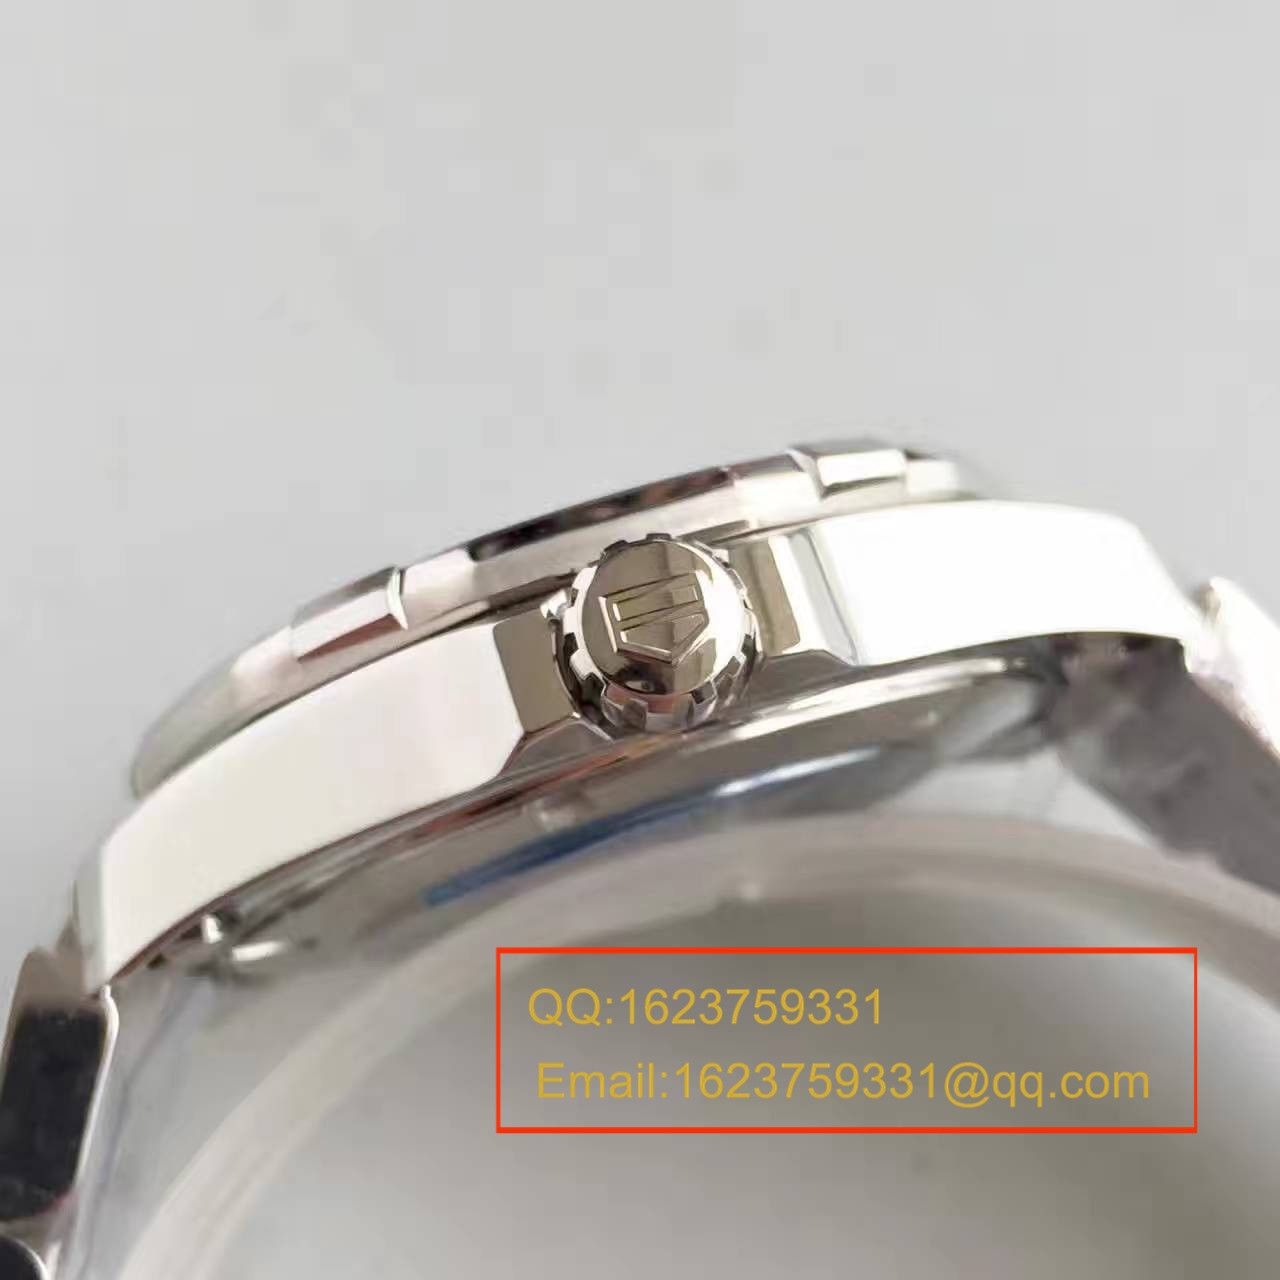 【MK厂一比一复刻手表】泰格豪雅竞潜系列WAY201B.BA0927腕表 / TGBA047